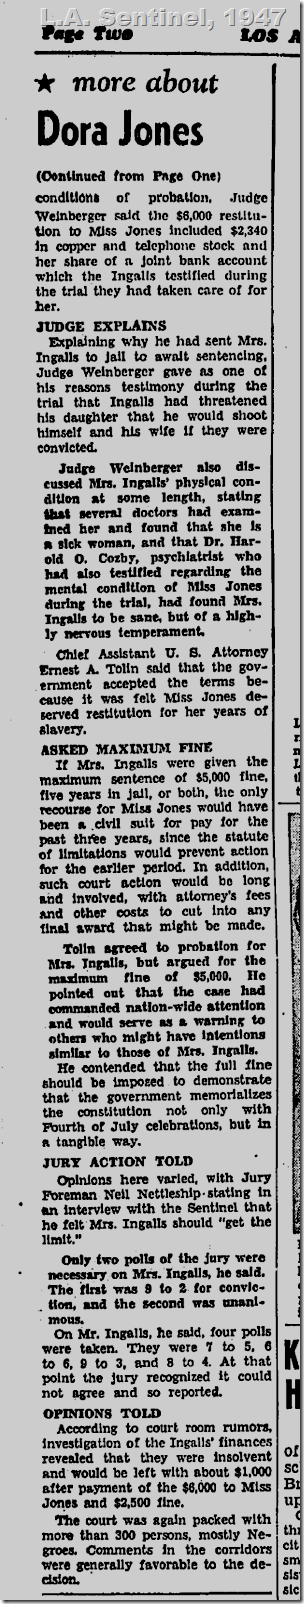 July 31, 1947, L.A. Sentinel, Slavery Trial